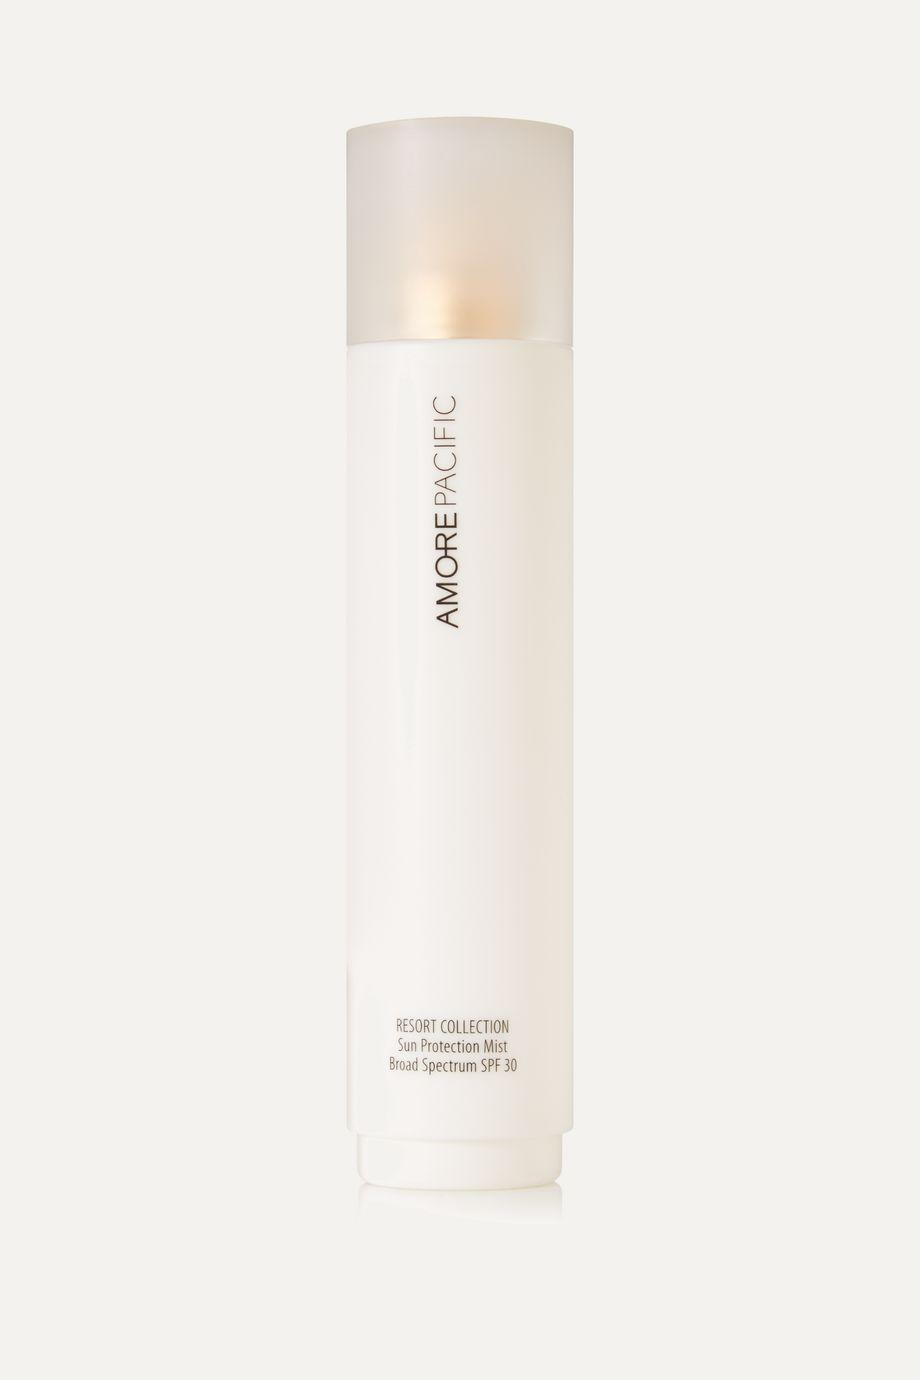 AMOREPACIFIC SPF30 Sun Protection Mist, 200ml